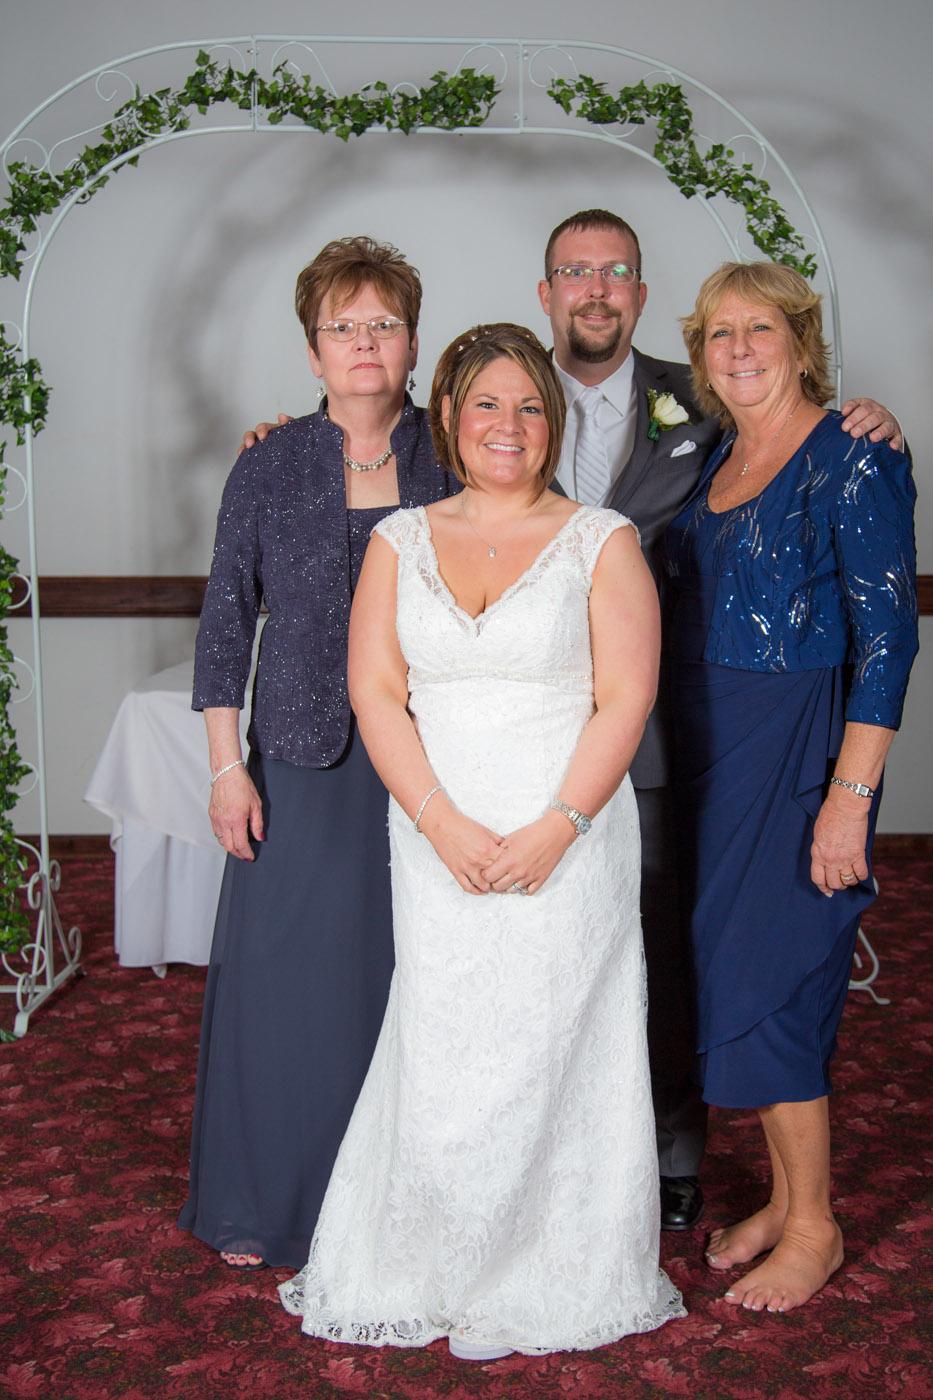 Healy Wedding 1 1440.jpg